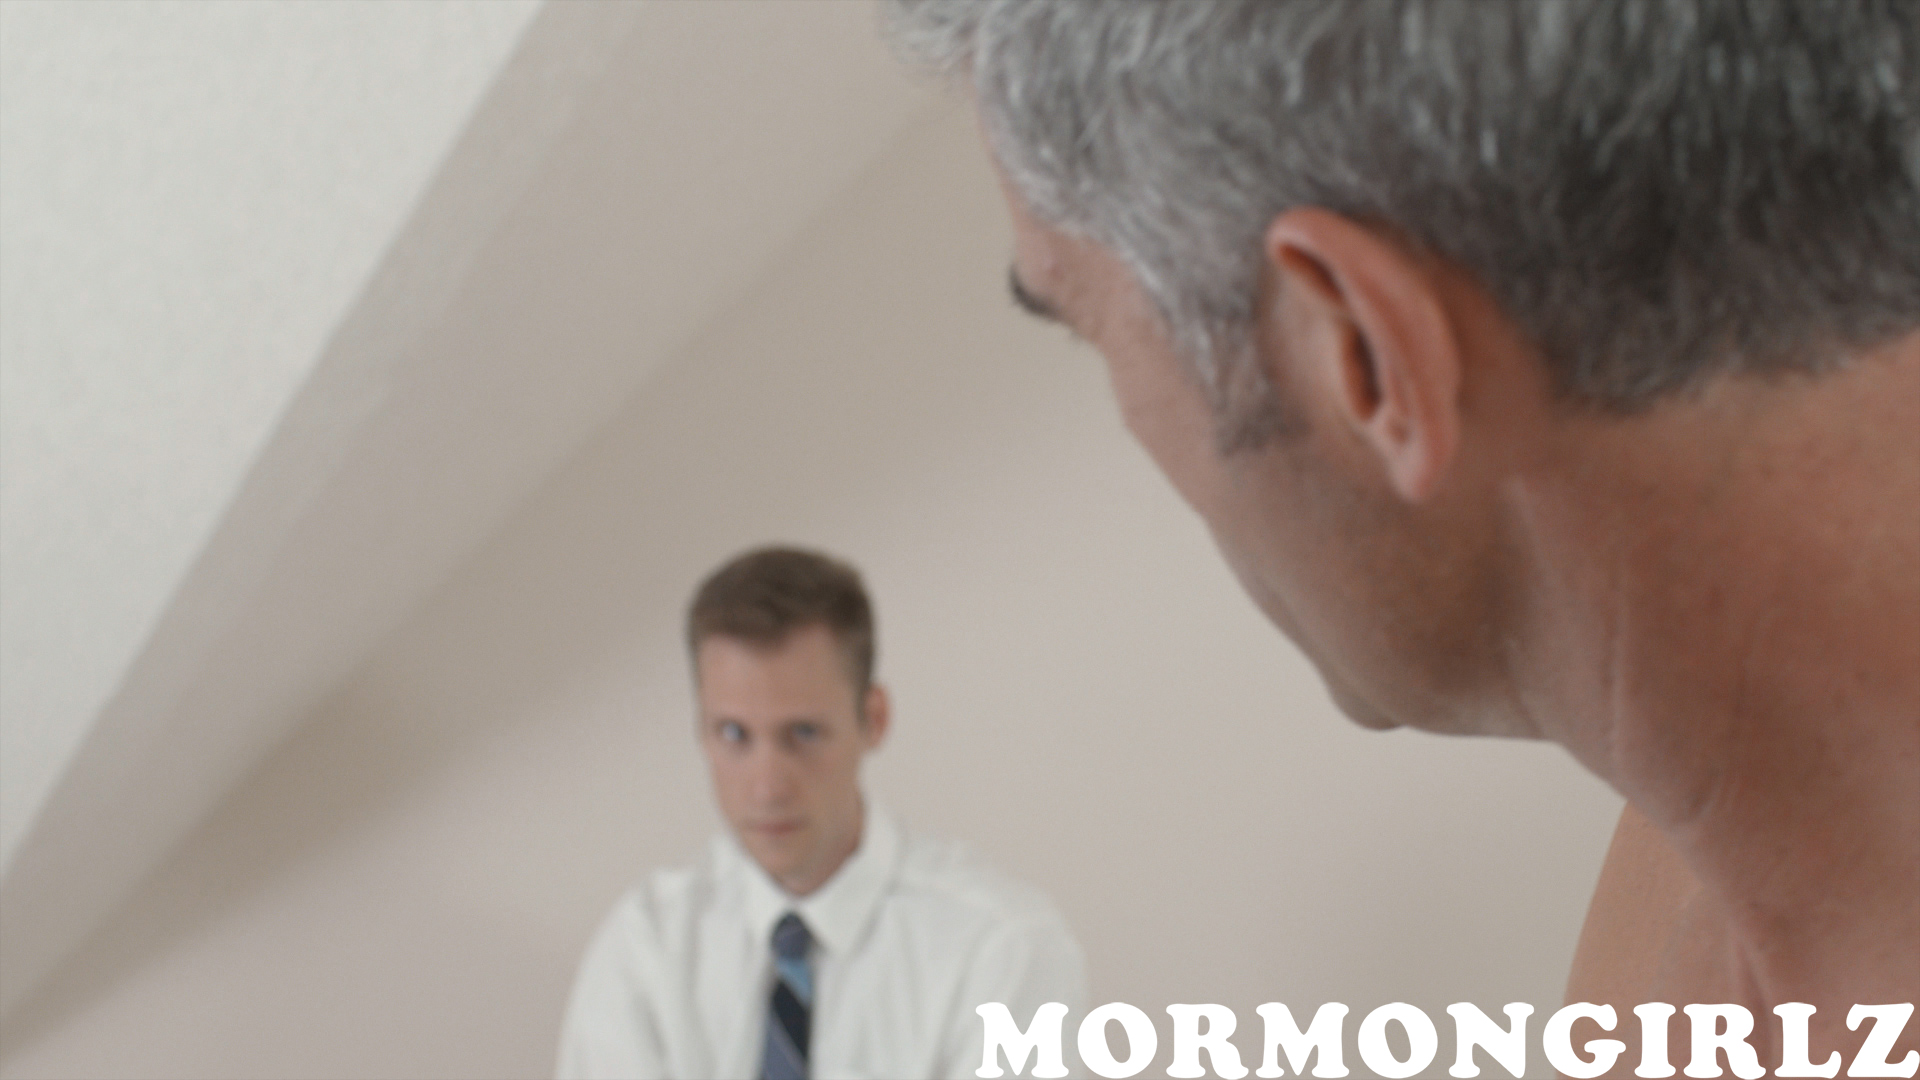 076_mormongirlz_0033